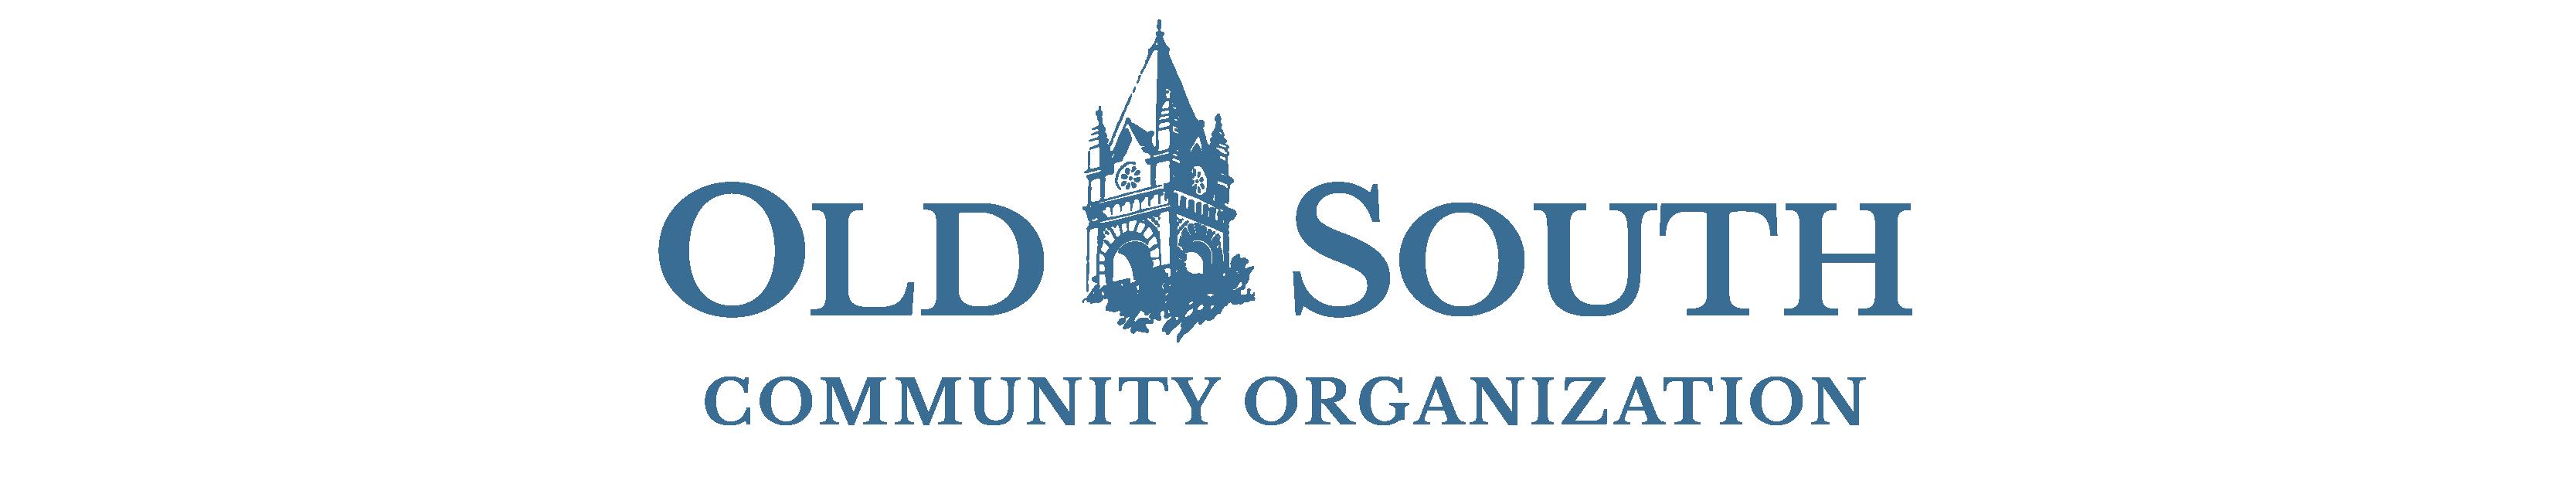 Old South Community Organization (OSCO) Logo